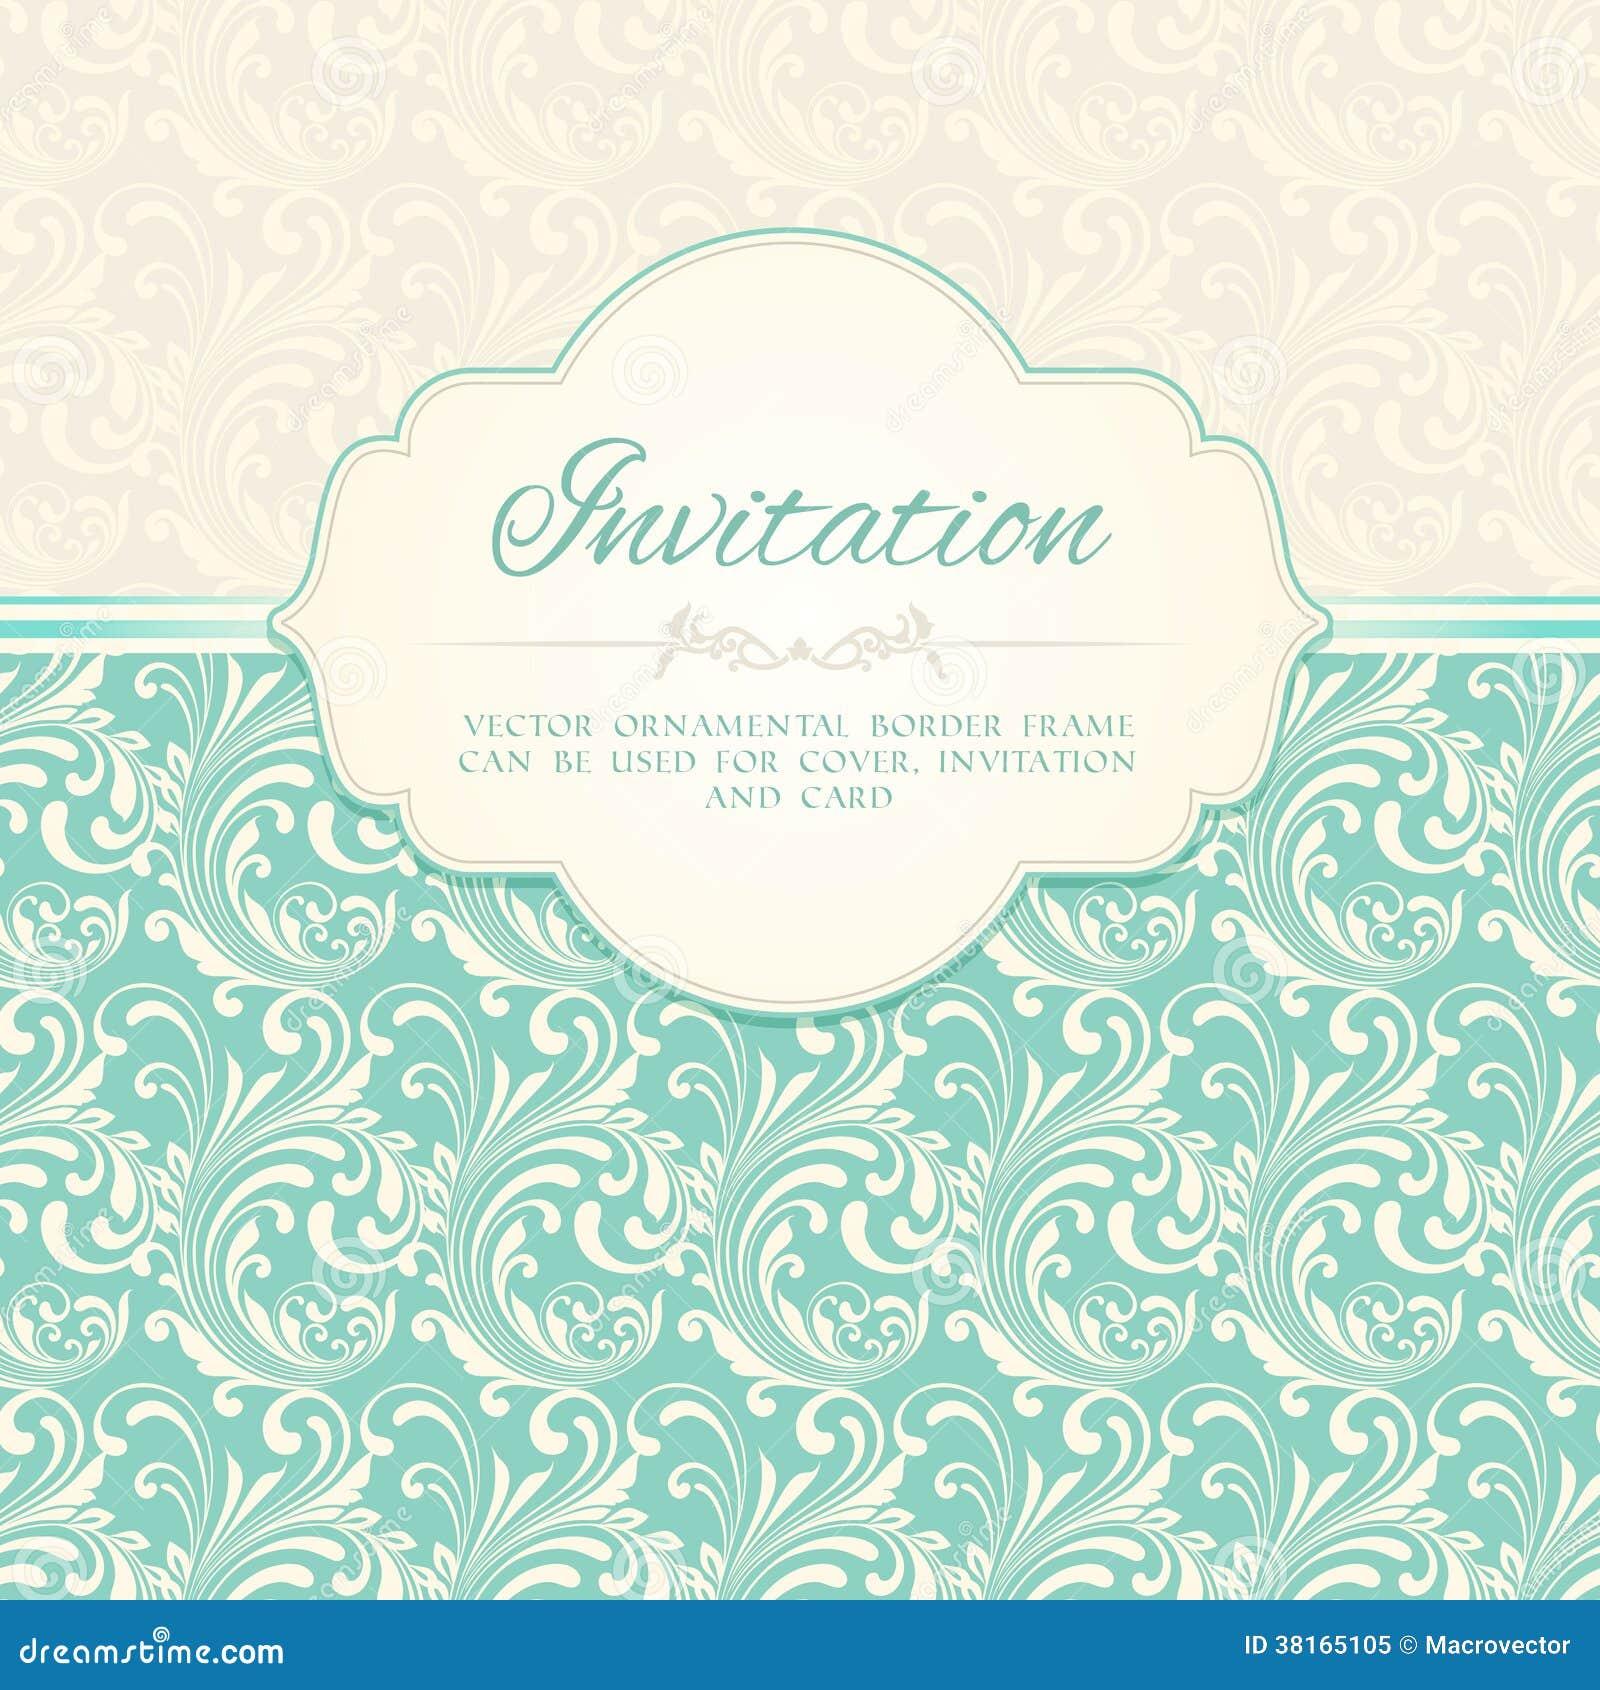 Ornamental Pattern Invitation Card Royalty Free Stock Photo